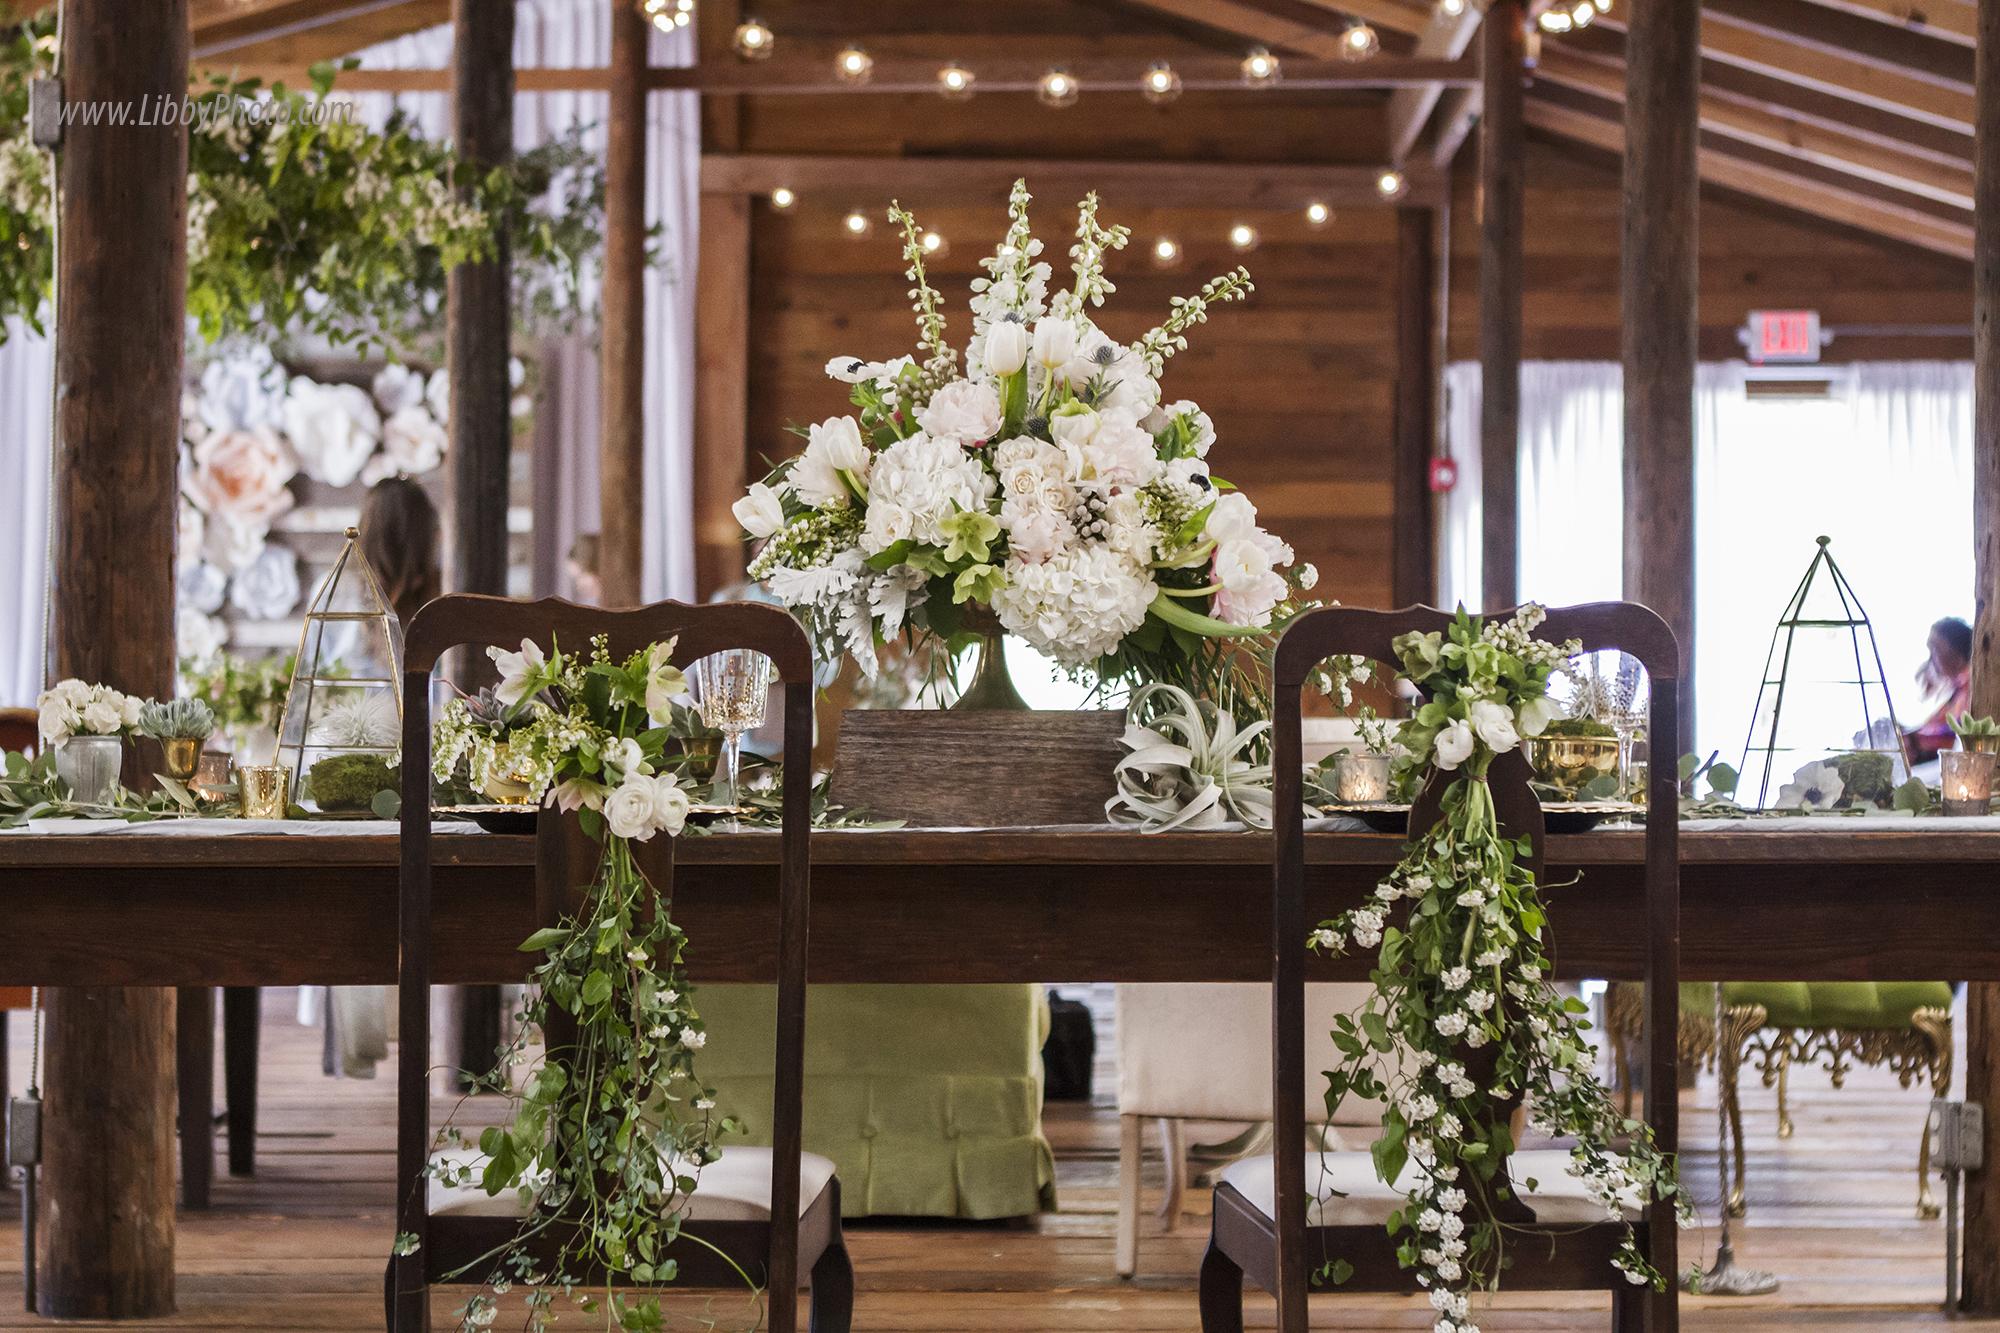 Atlanta wedding photography, Libbyphoto (11).jpg